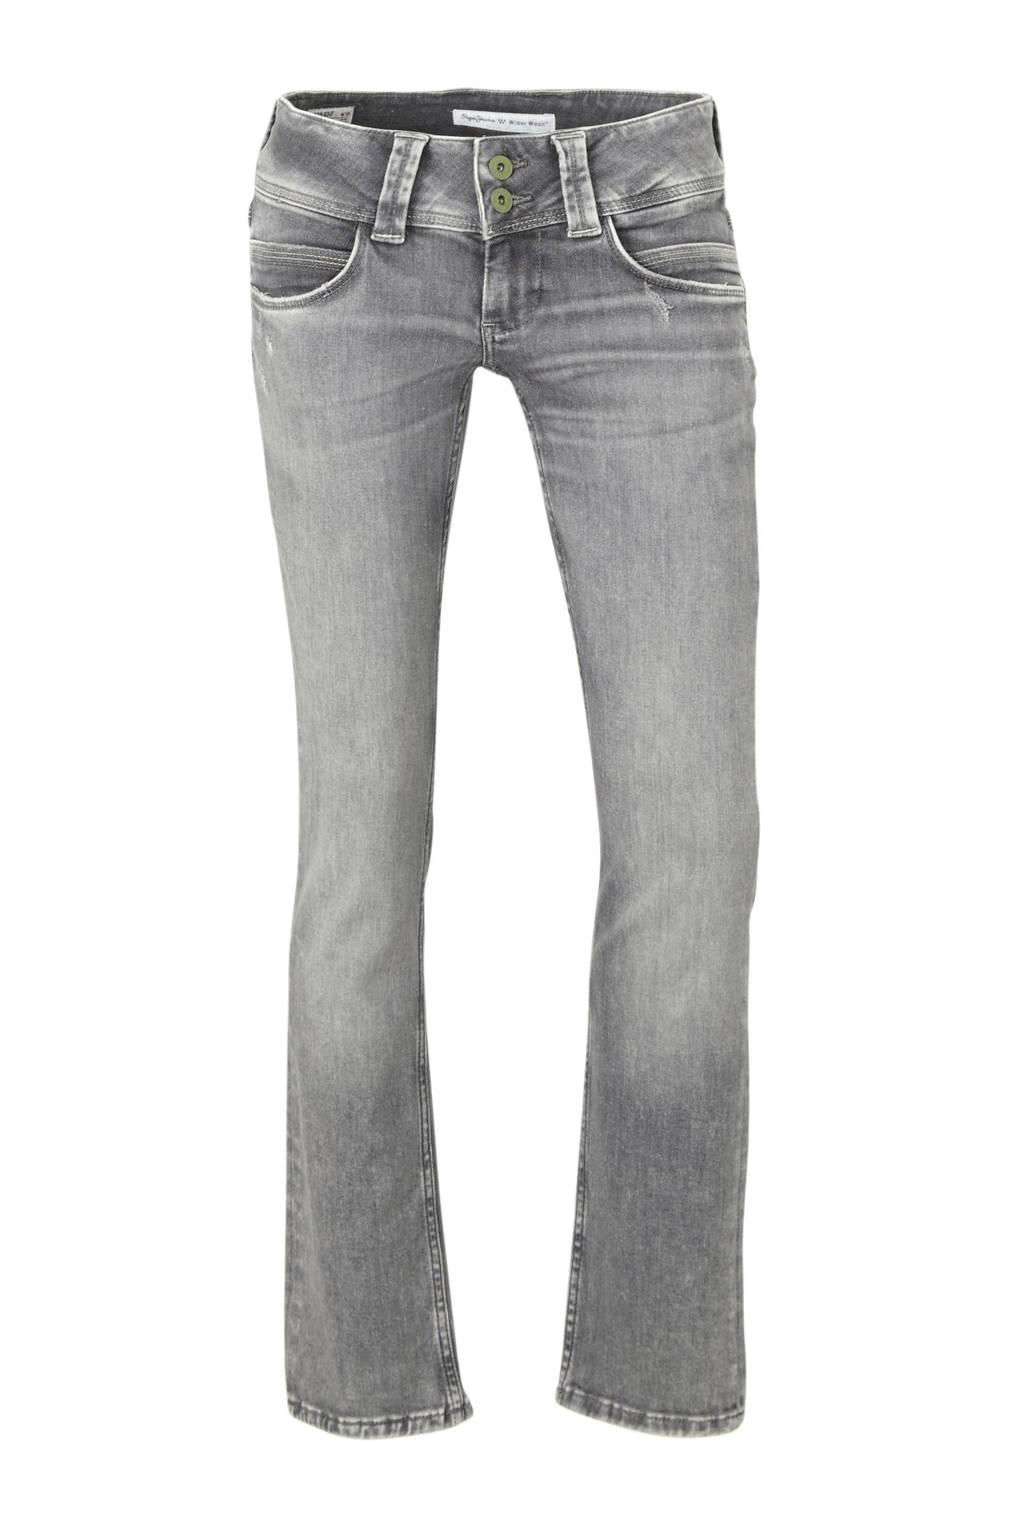 Pepe Jeans low waist straight fit jeans Venus grijs, Grijs